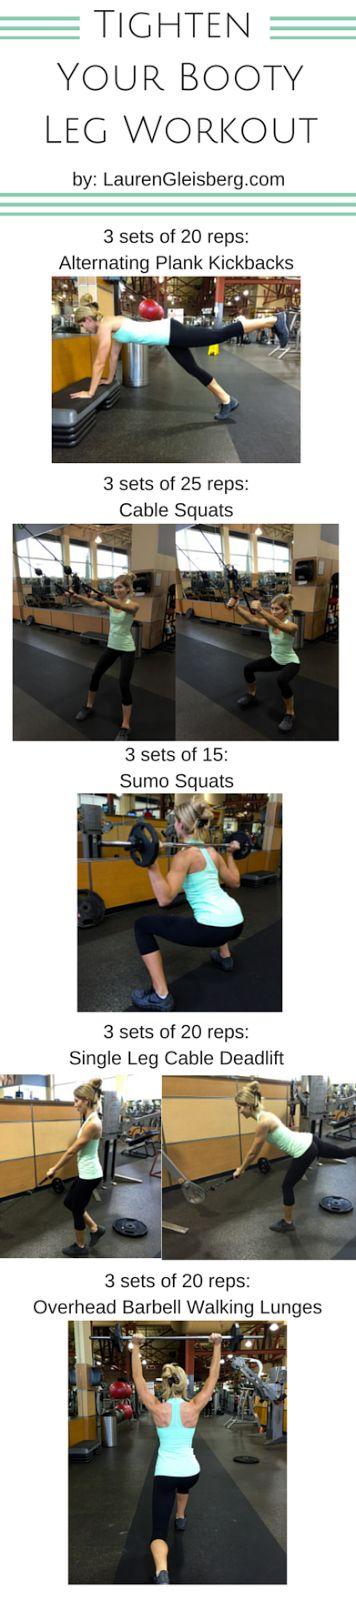 Day 30: Tighten Your Booty Leg Workout | #LGKickStartFit Health & Fitness Challenge by LaurenGleisberg.com